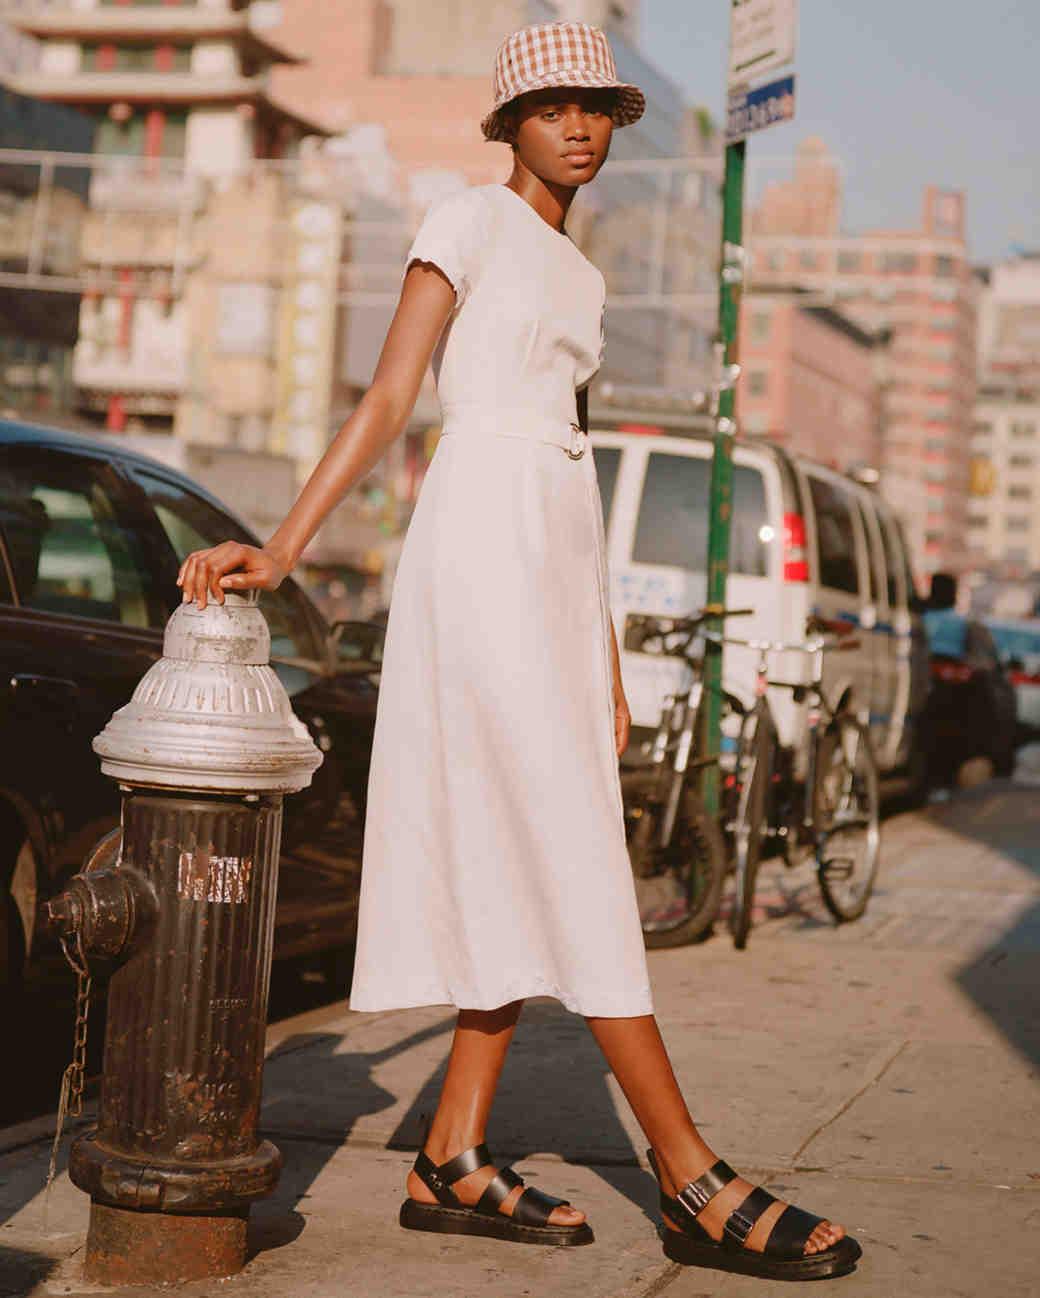 lein fall 2019 a-line tea length short sleeved dress with high neckline and belt